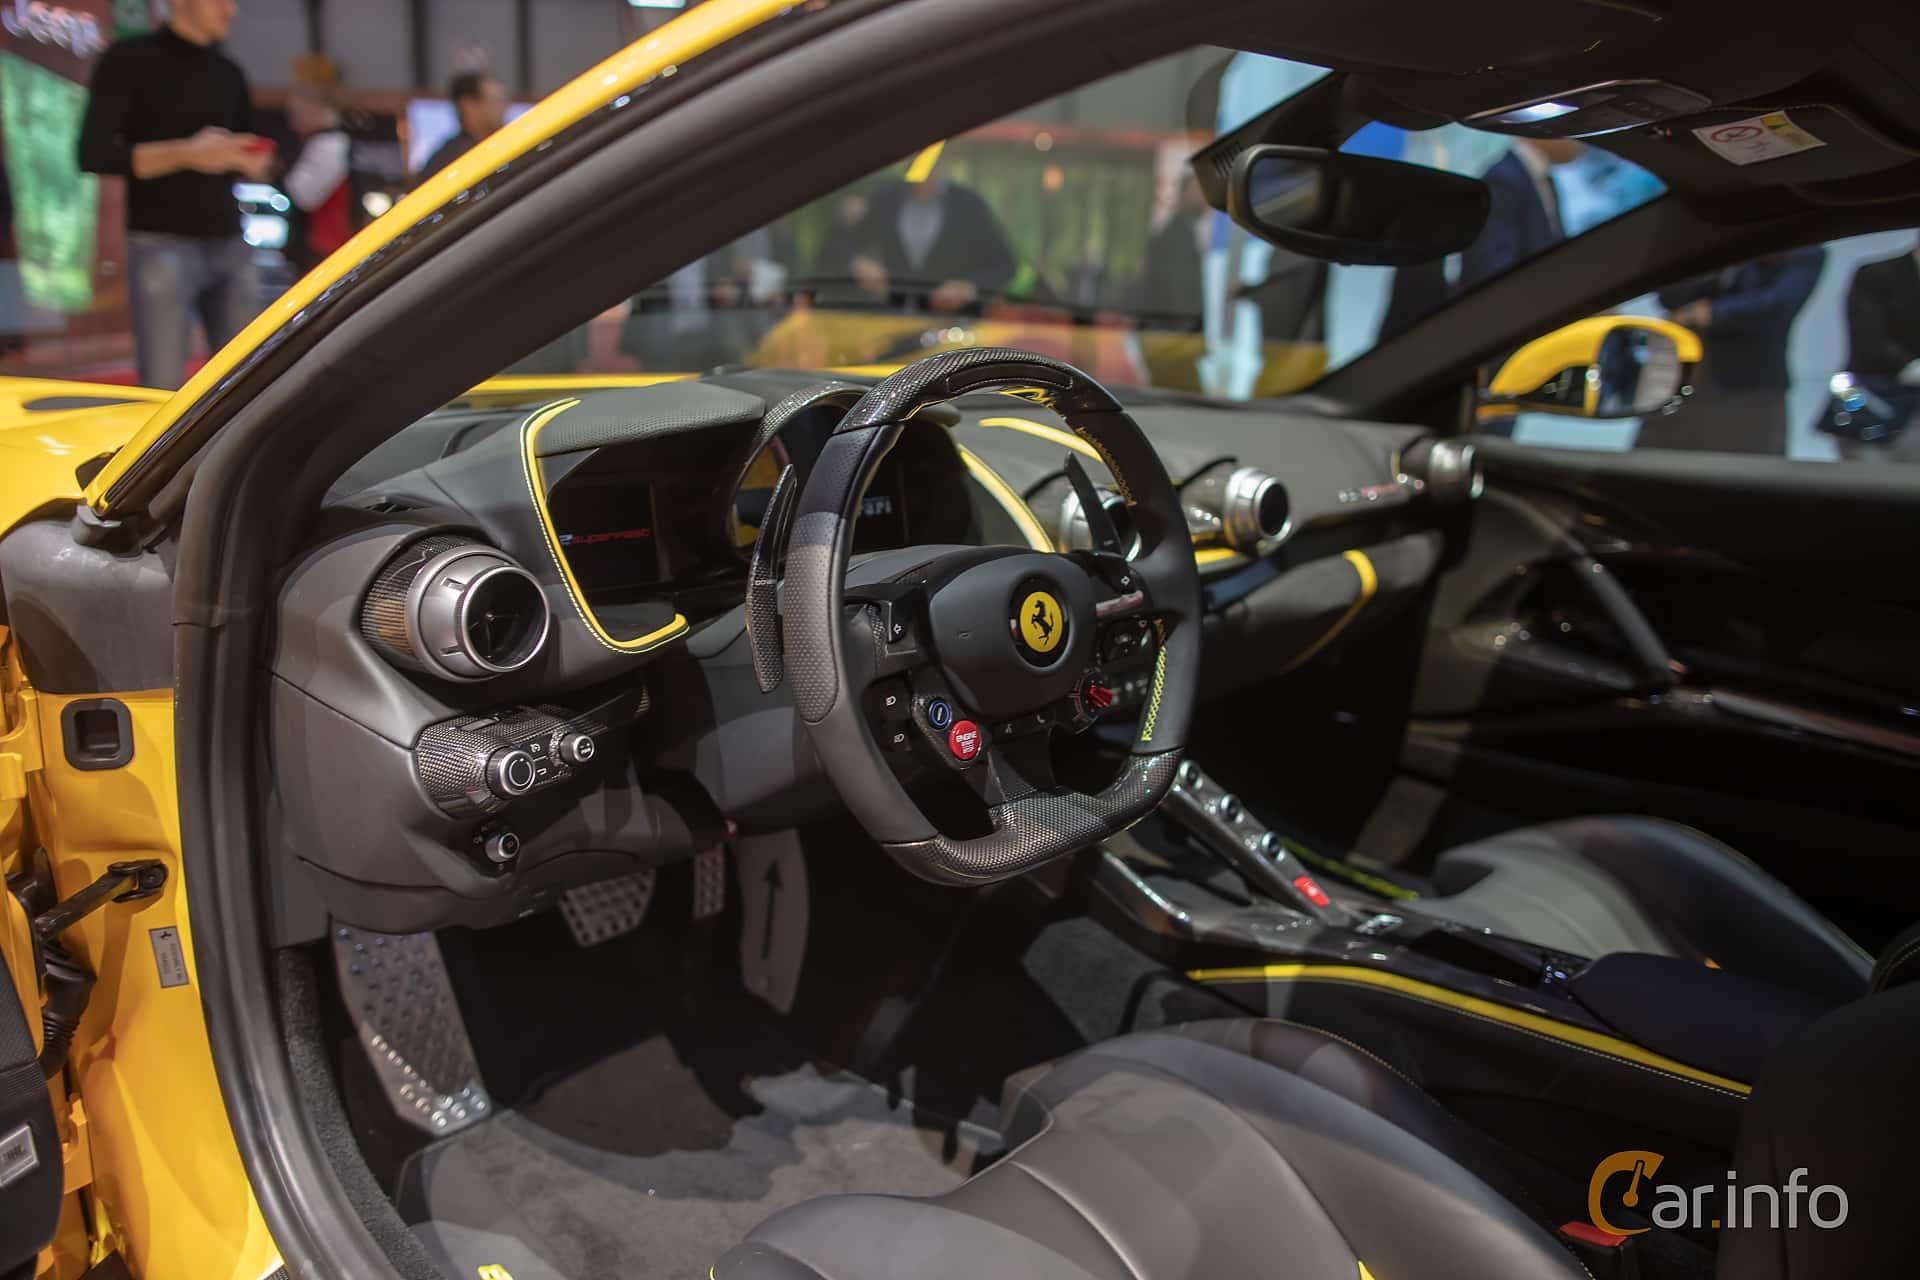 Ferrari 812 Superfast 6 5 V12 Dct 800hp 2019